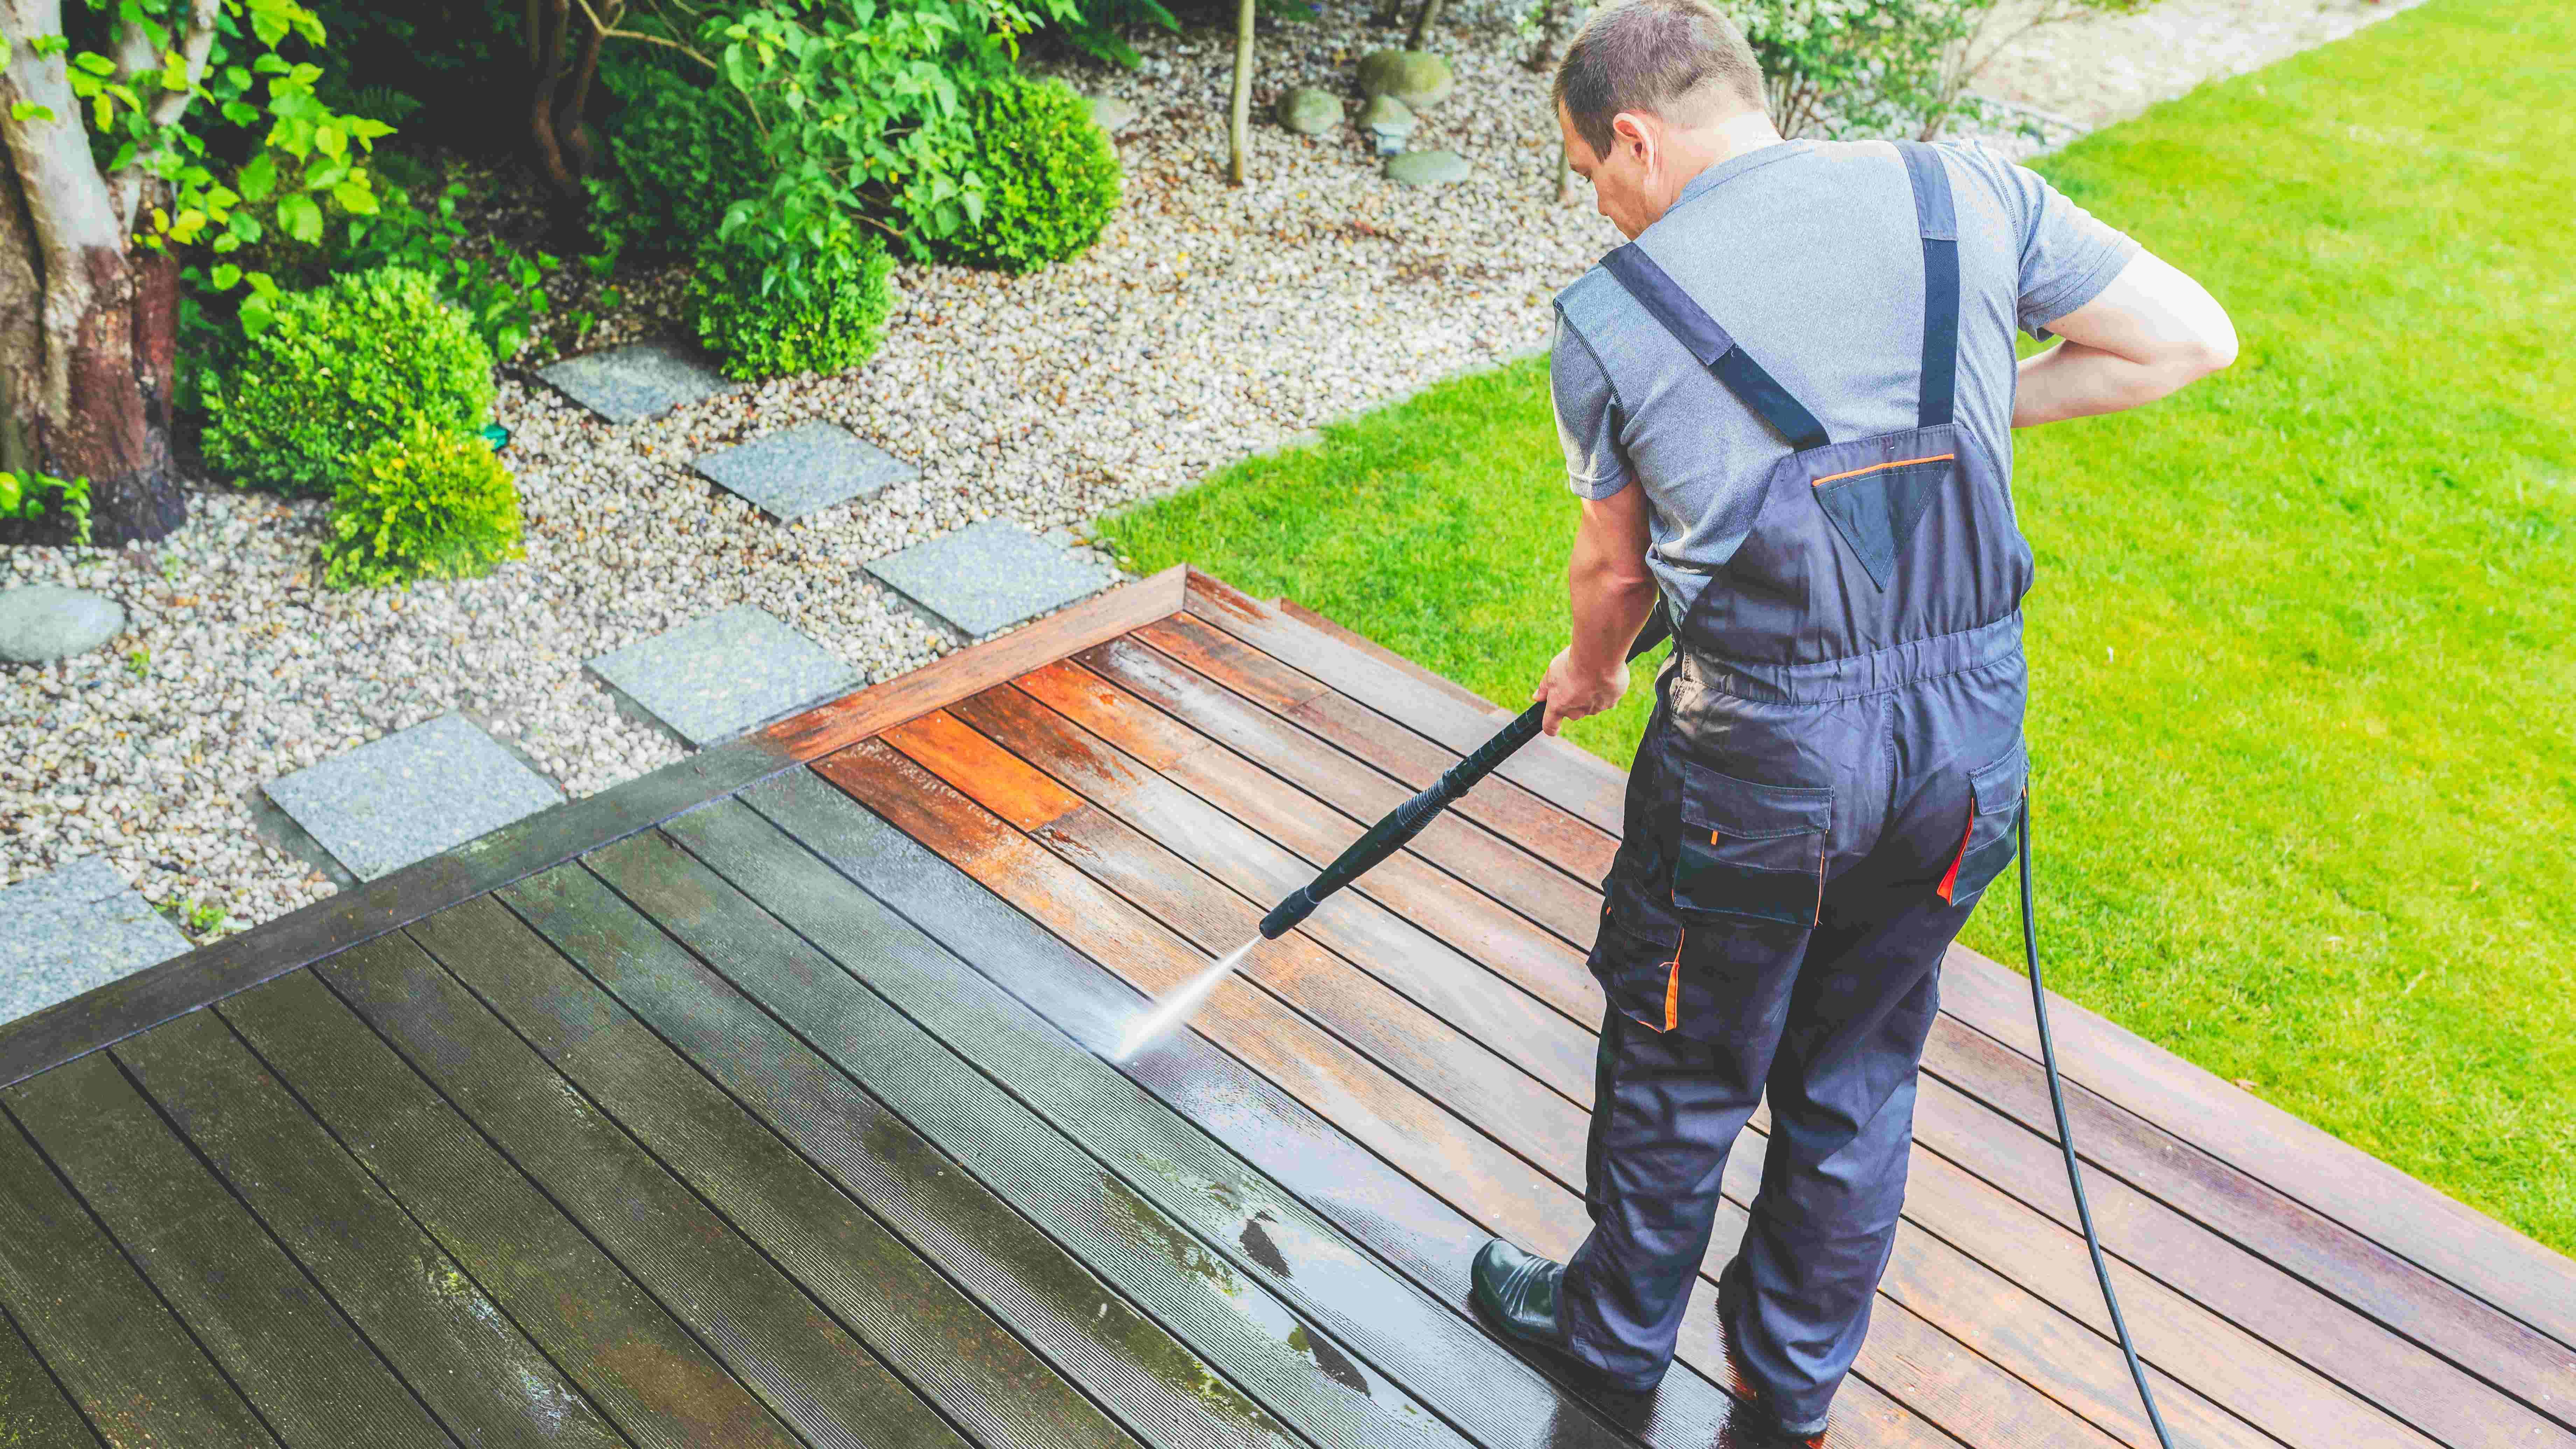 Comment nettoyer une terrasse